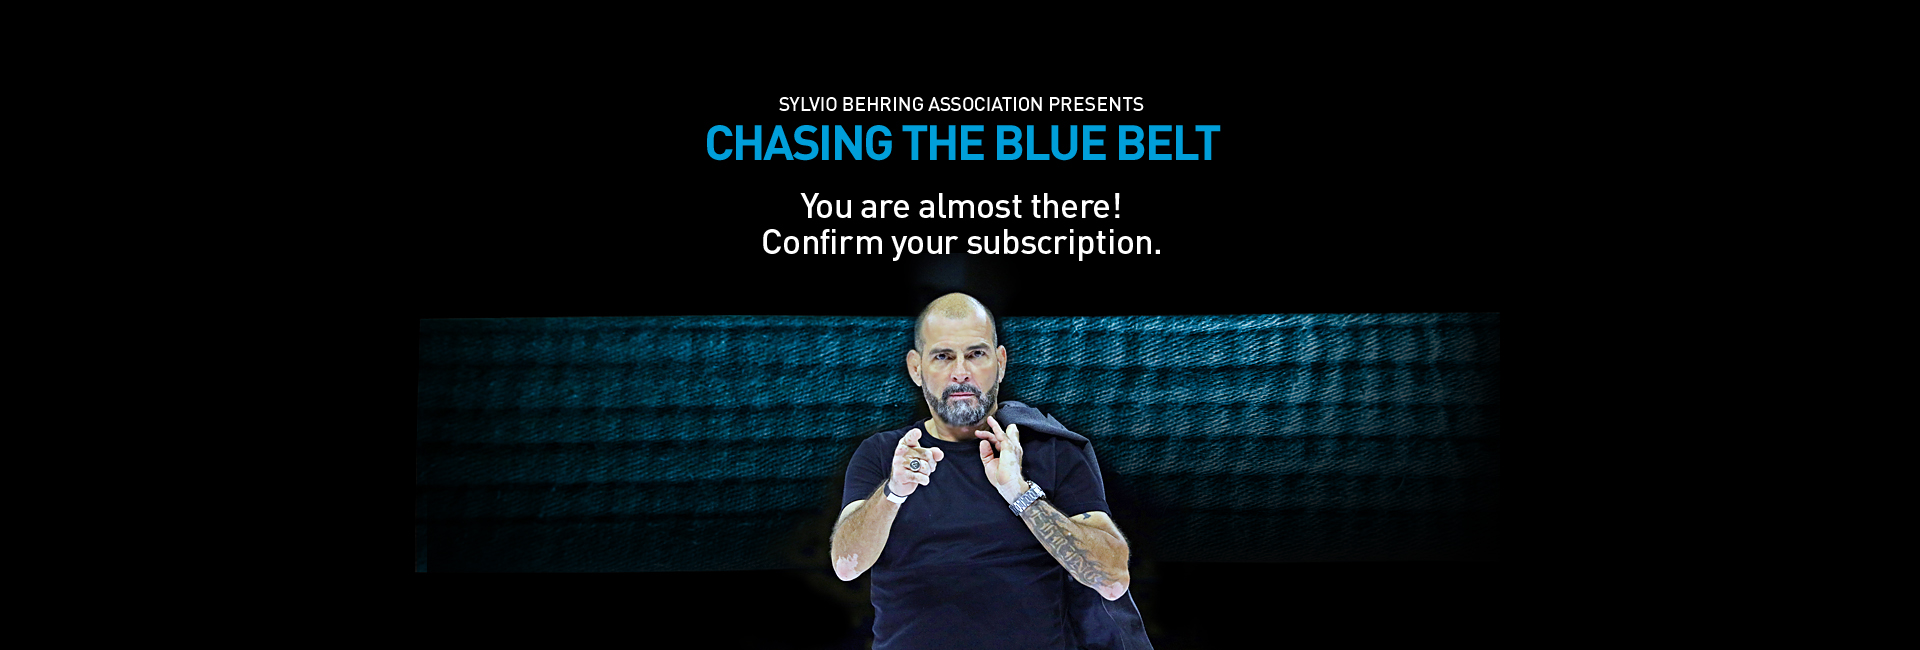 Sylvio-Behring-Association-Chasing-Blue-Belt-Payment